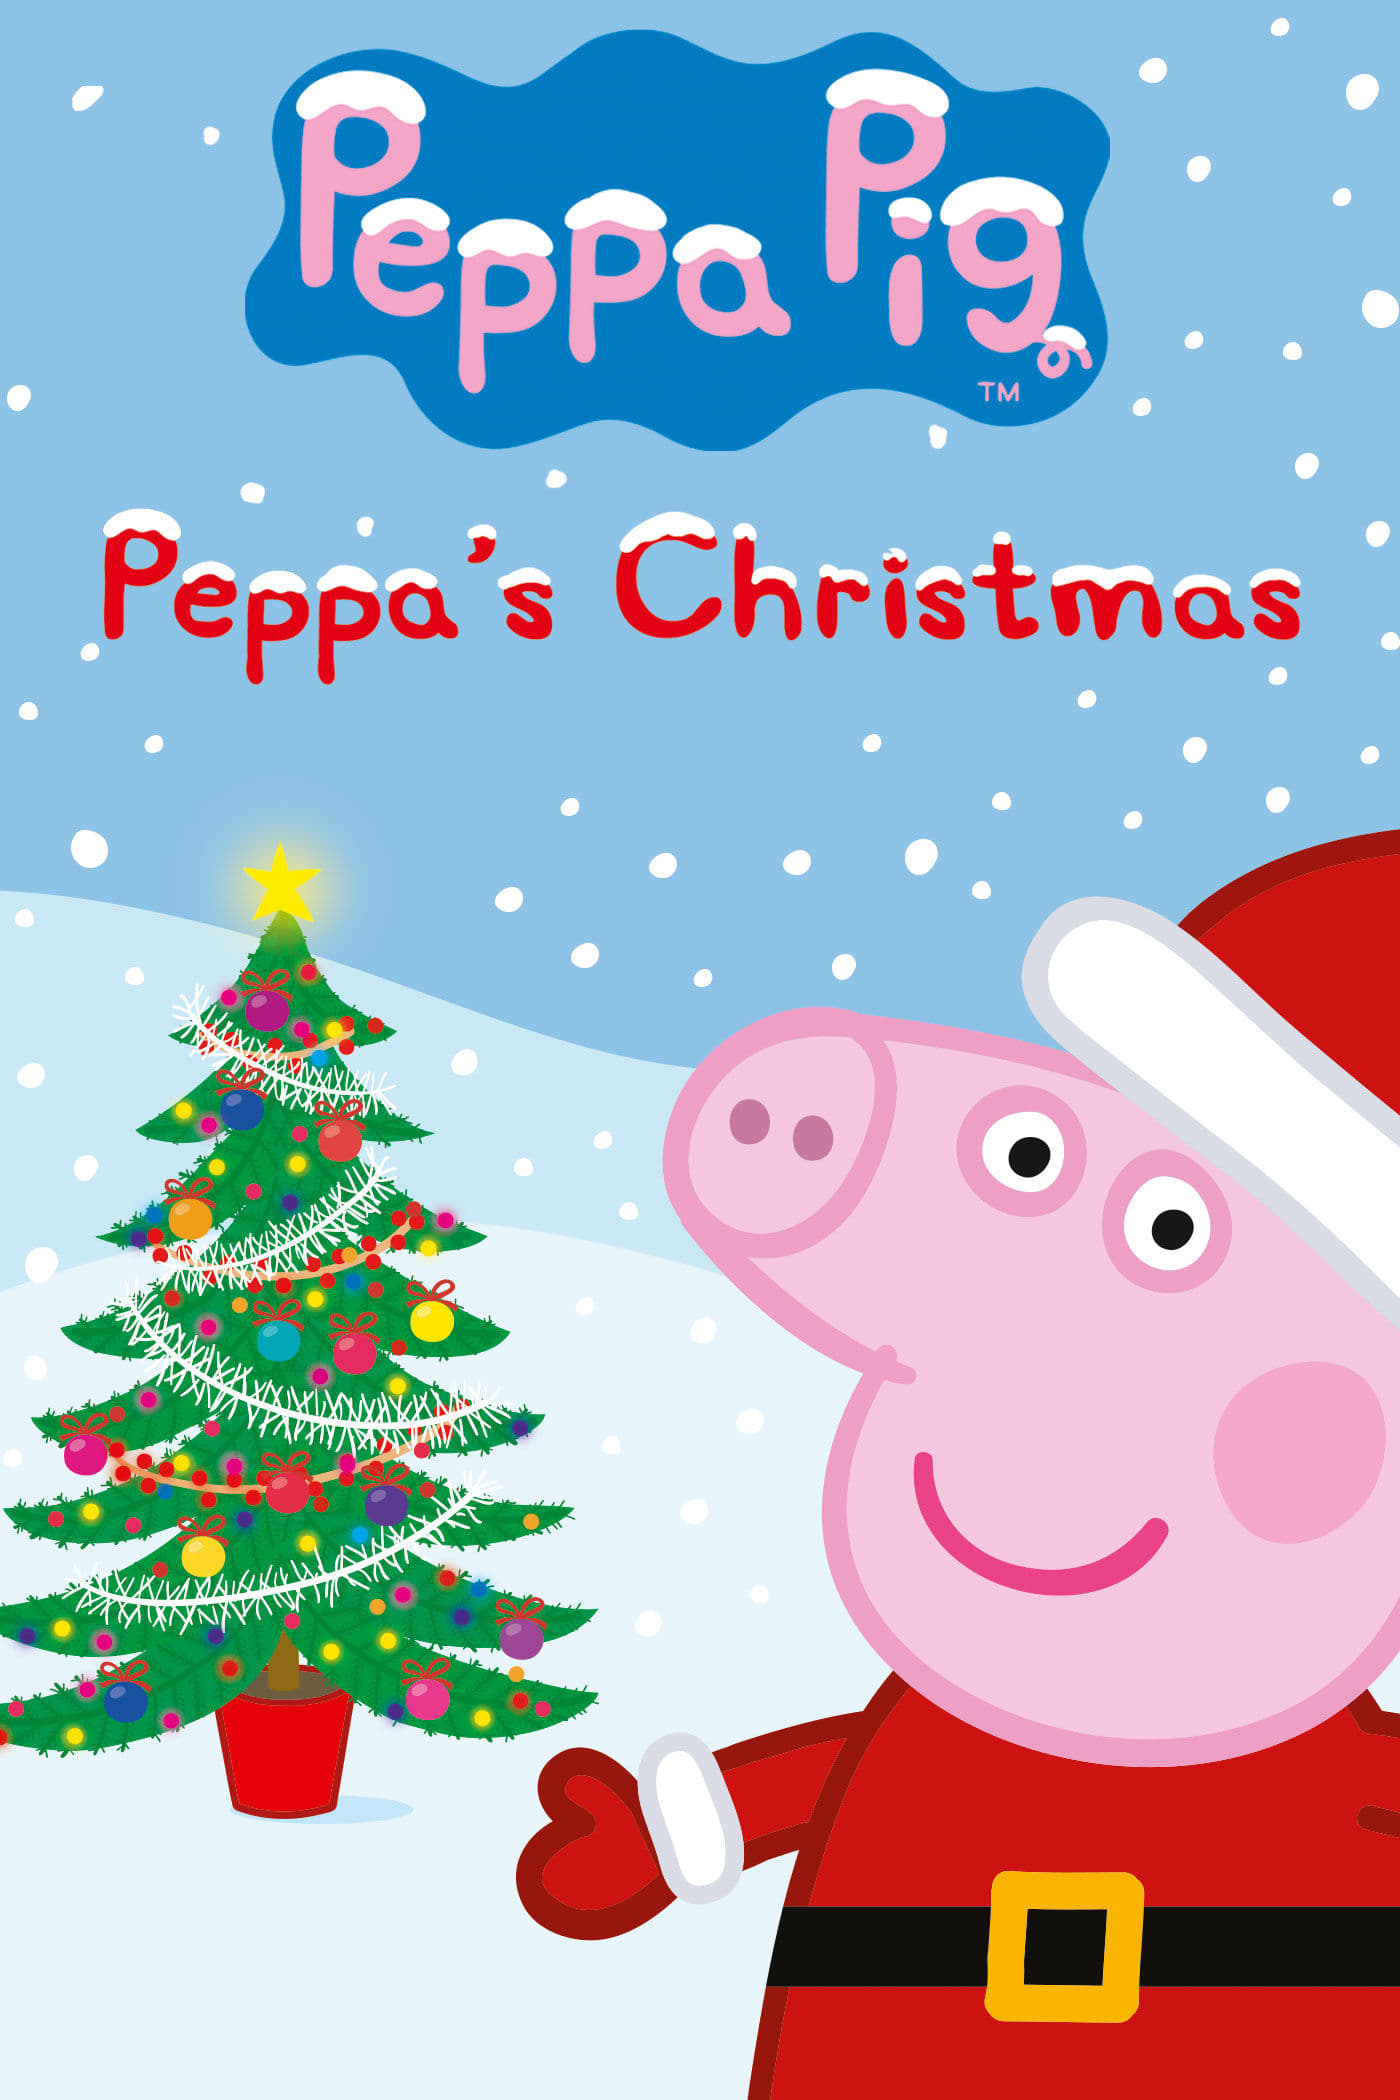 Peppa Pig: Peppa's Christmas (2015)